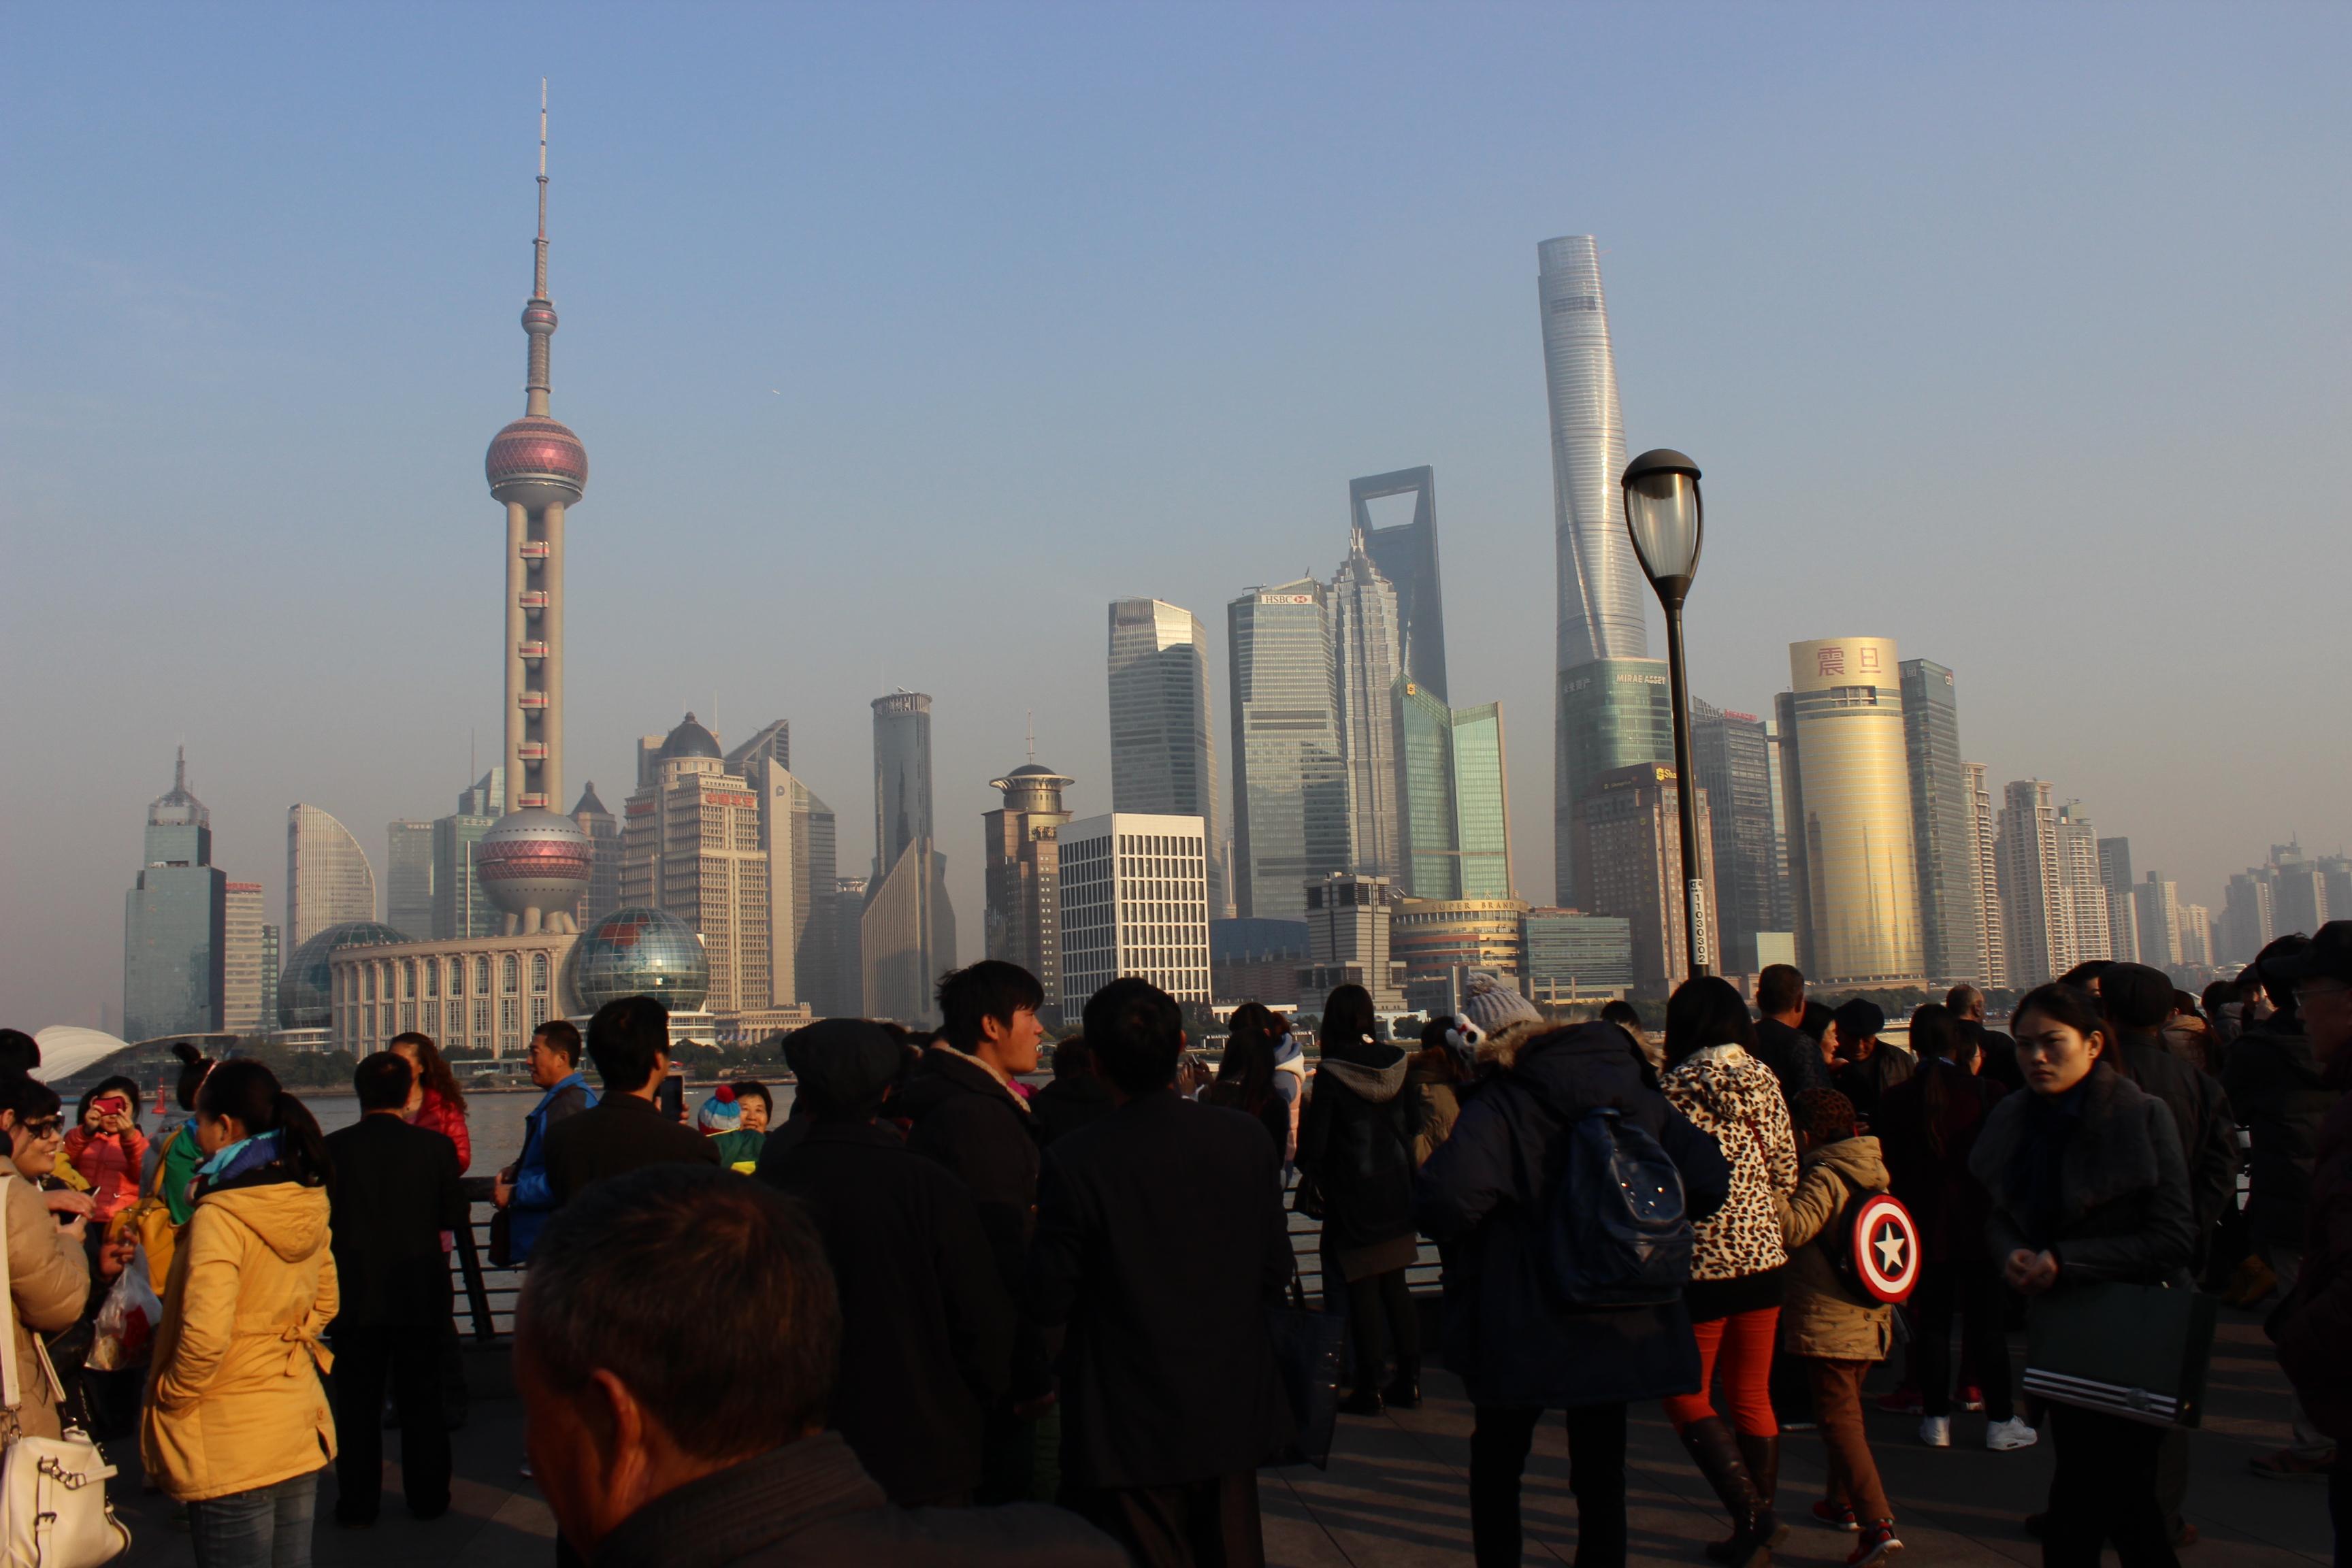 CAPAStudyAbroad_Bejing_Fall2014_from_Jasheah_Howard_-_TheBund_-_Shanghai3JPG